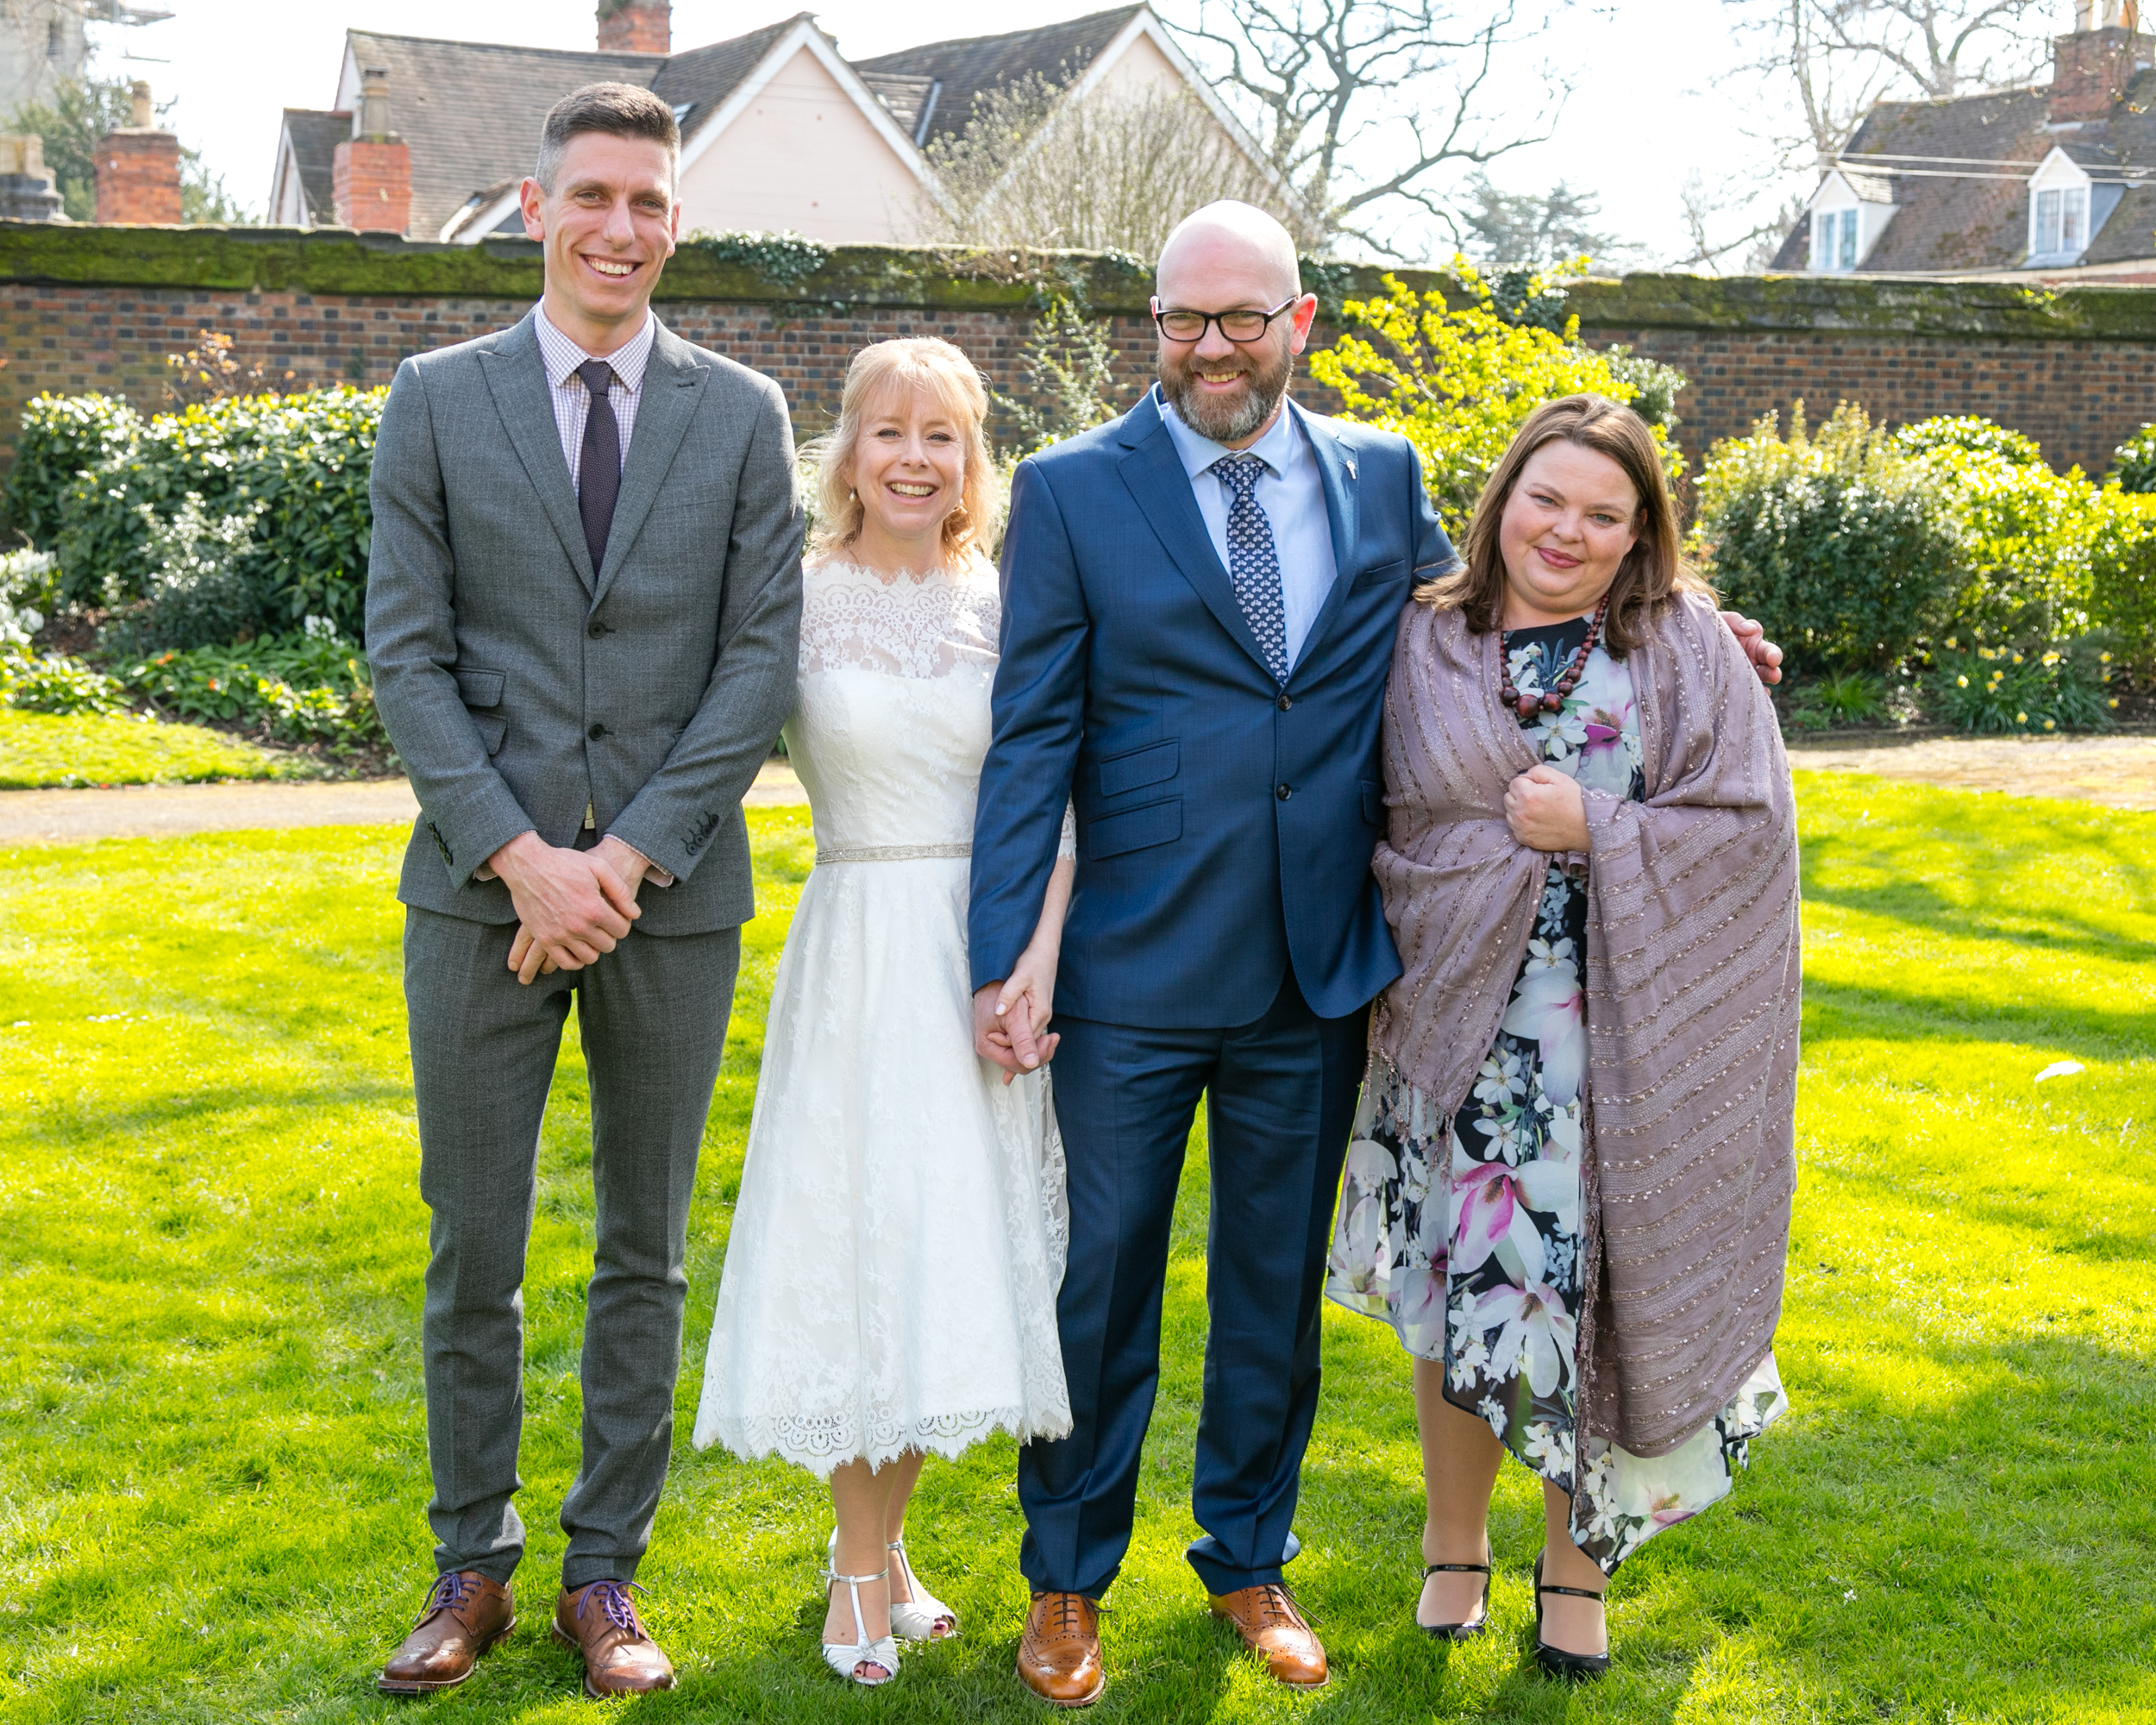 wedding-photography-at-Hill-Close-Gardens-Warwick59.jpg